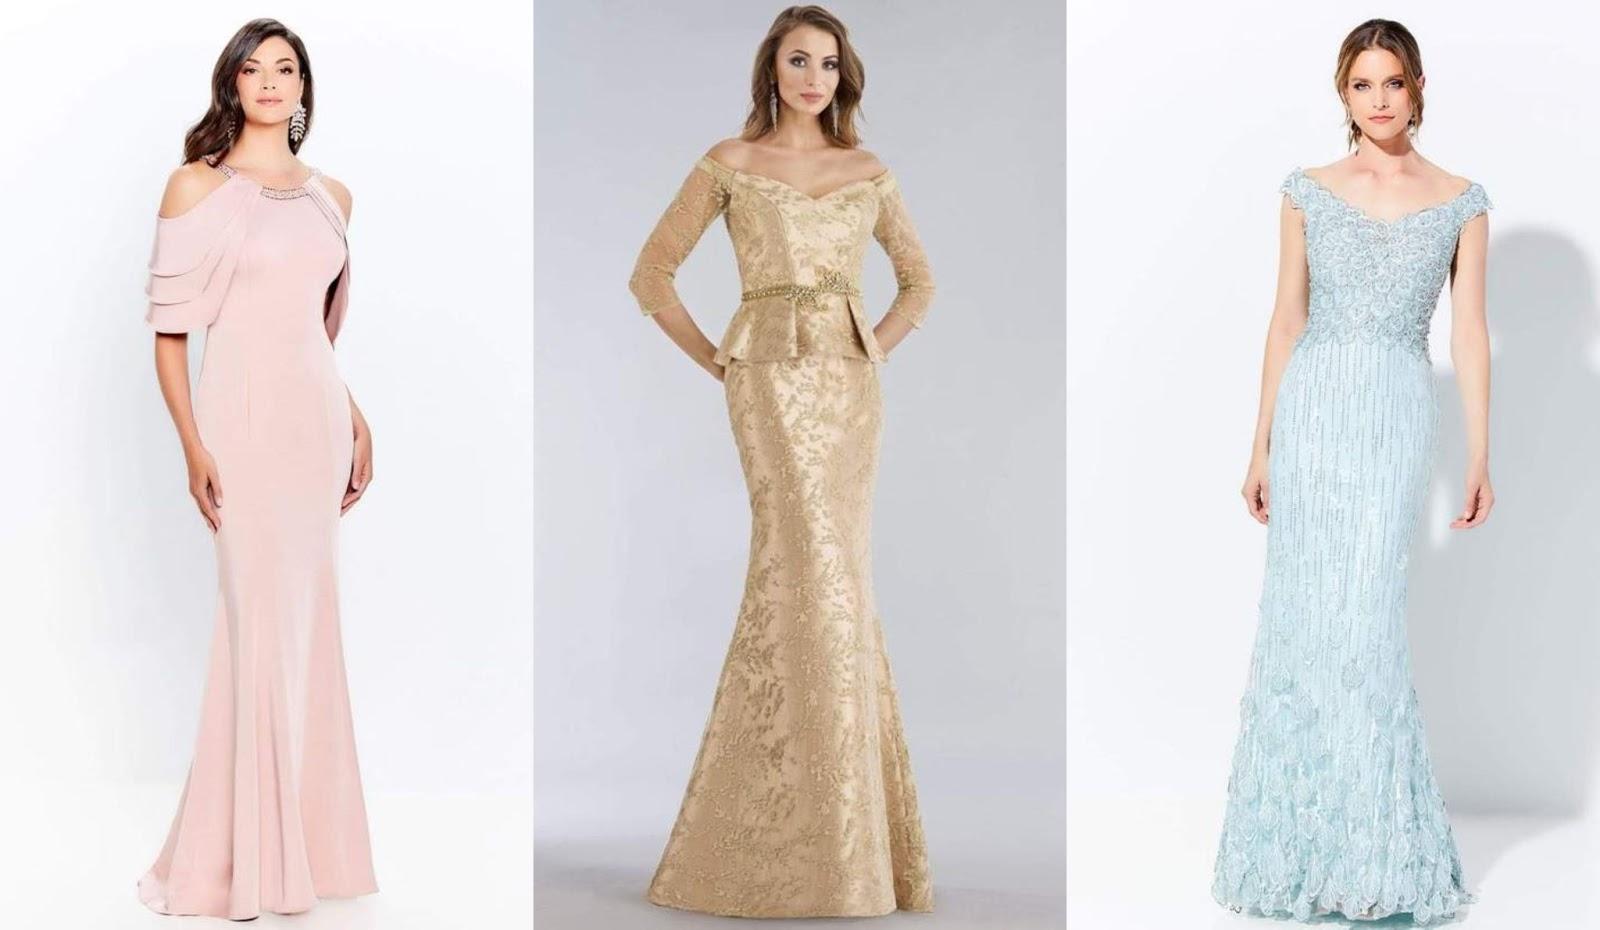 Bride dresses